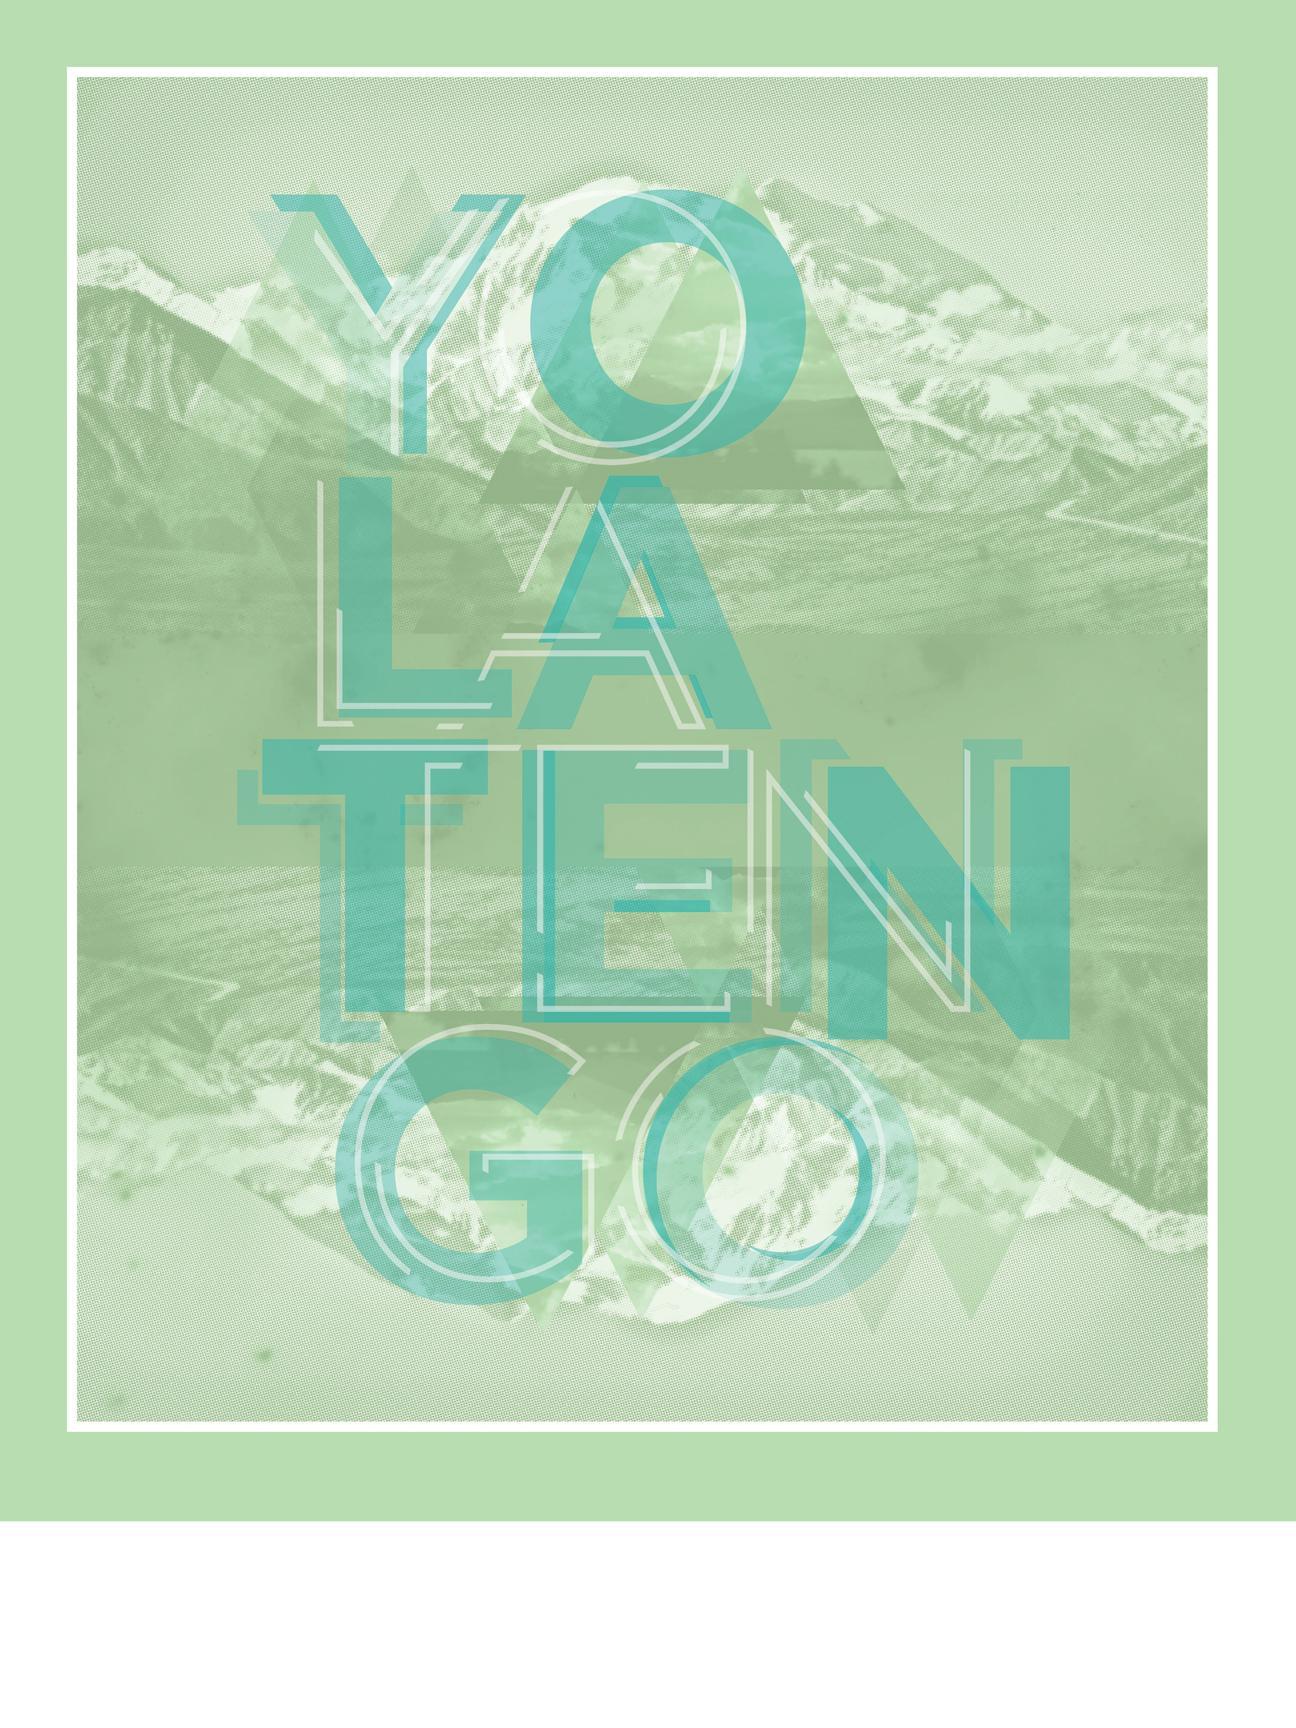 Yo La Tengo - image 3 - student project